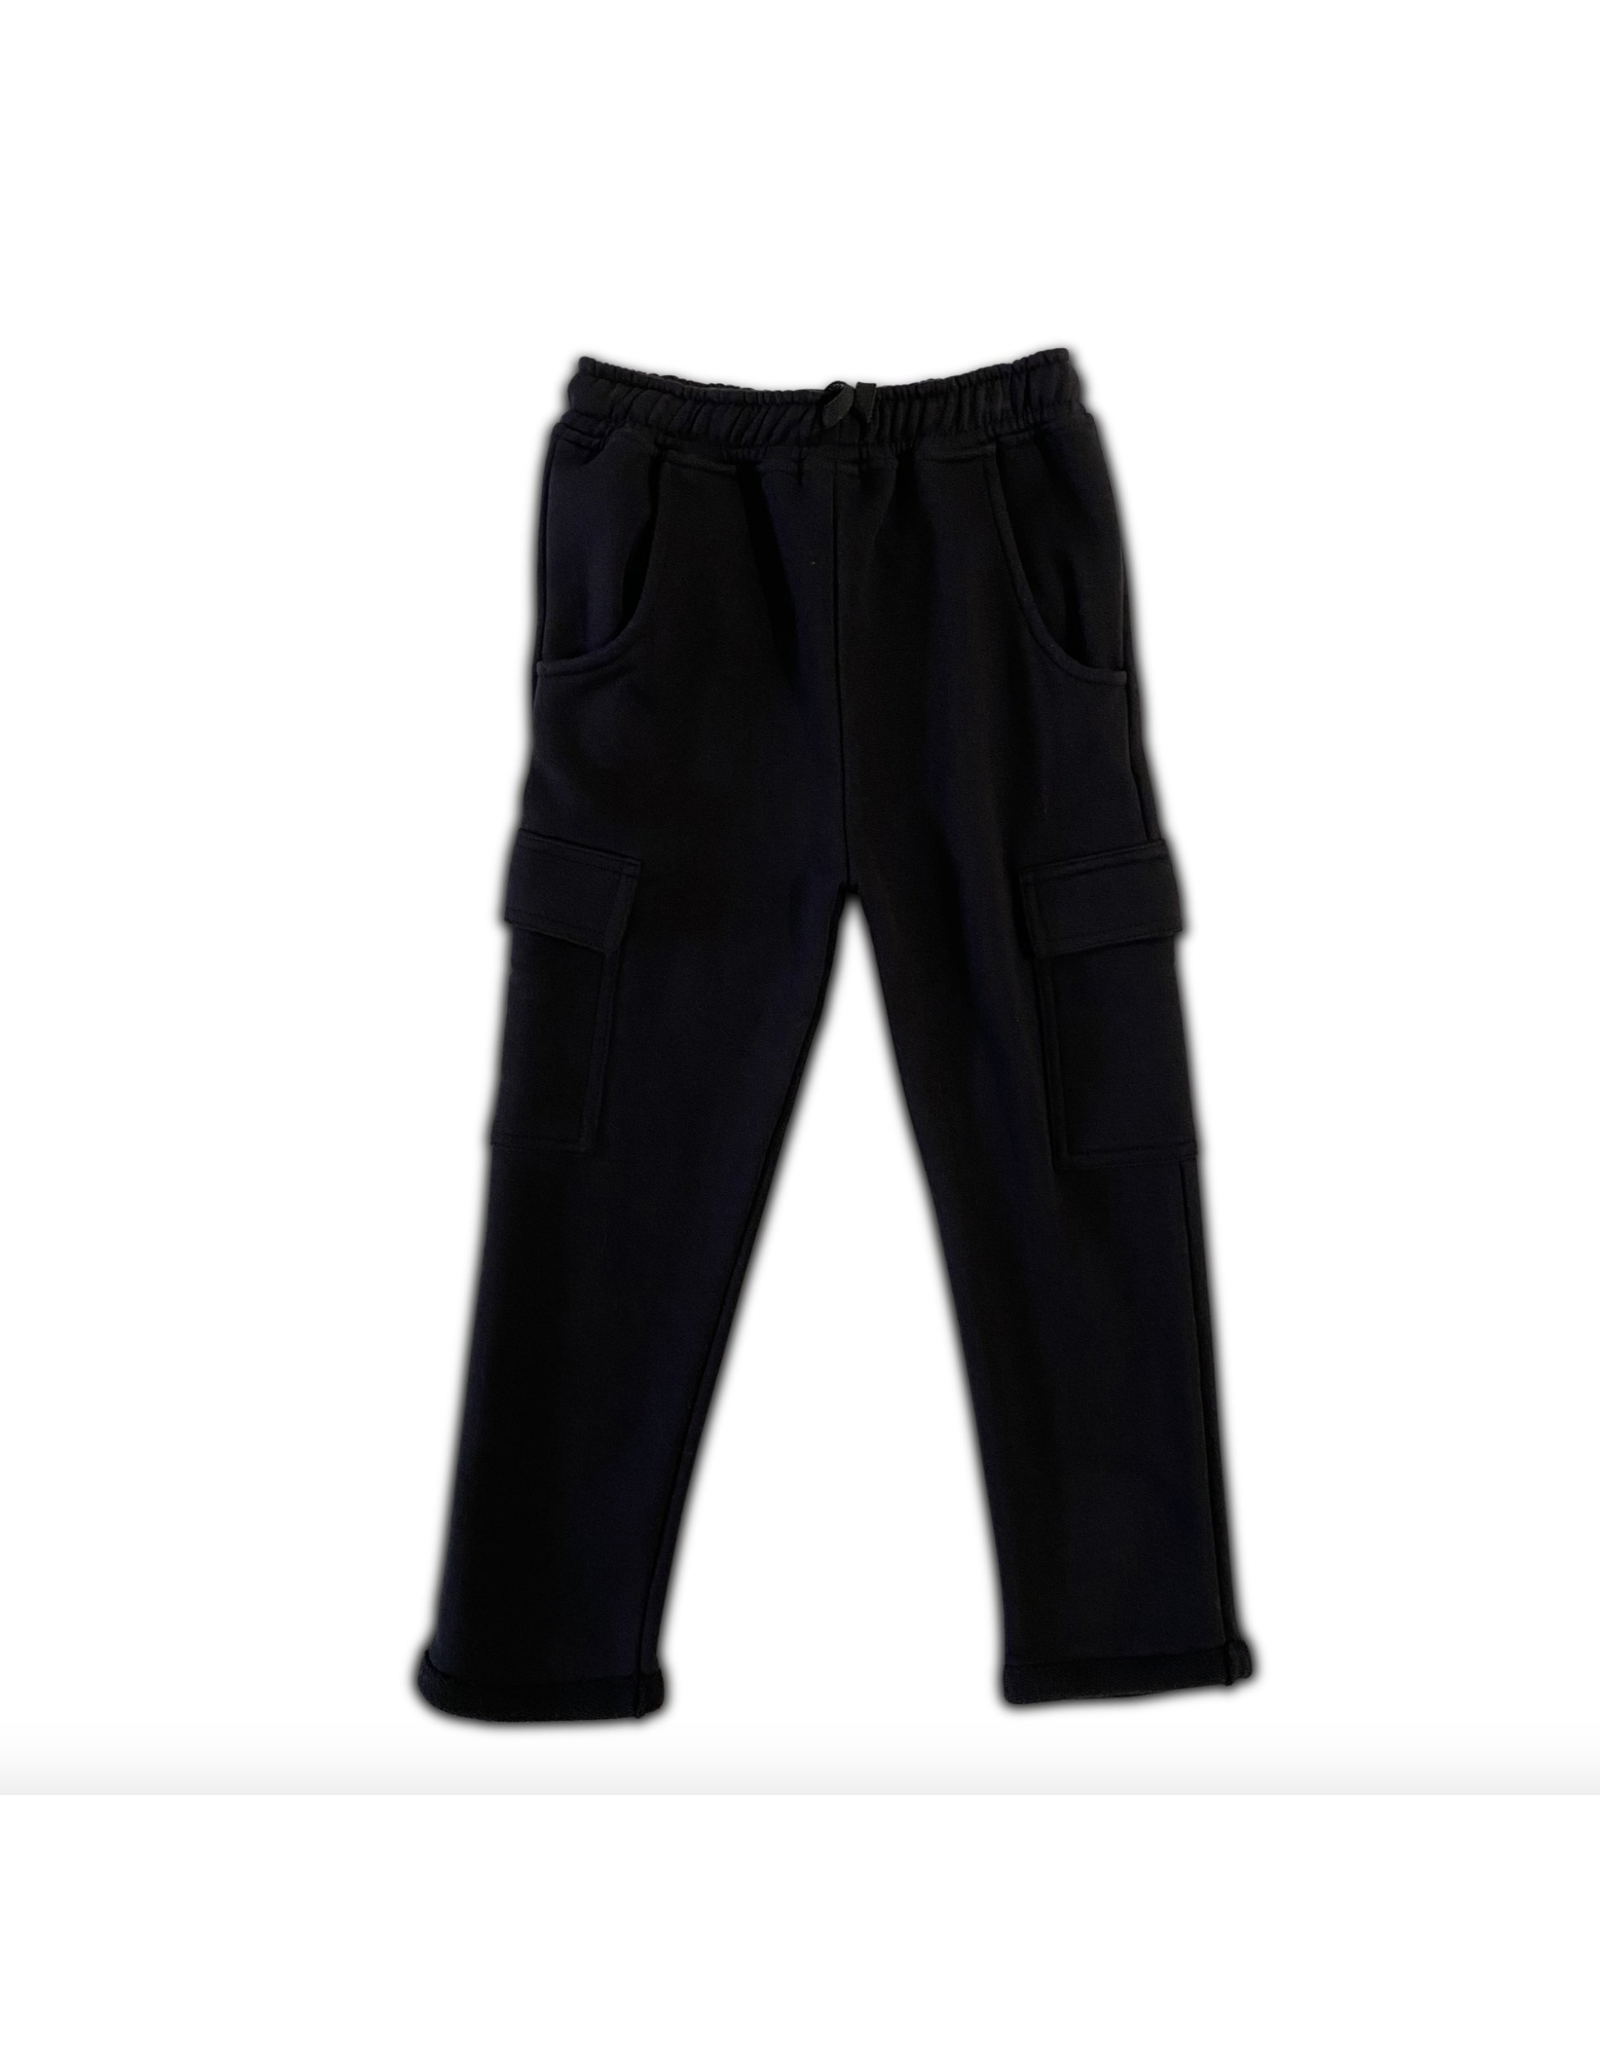 COS I SAID SO Cargo pant BLACK ONYX